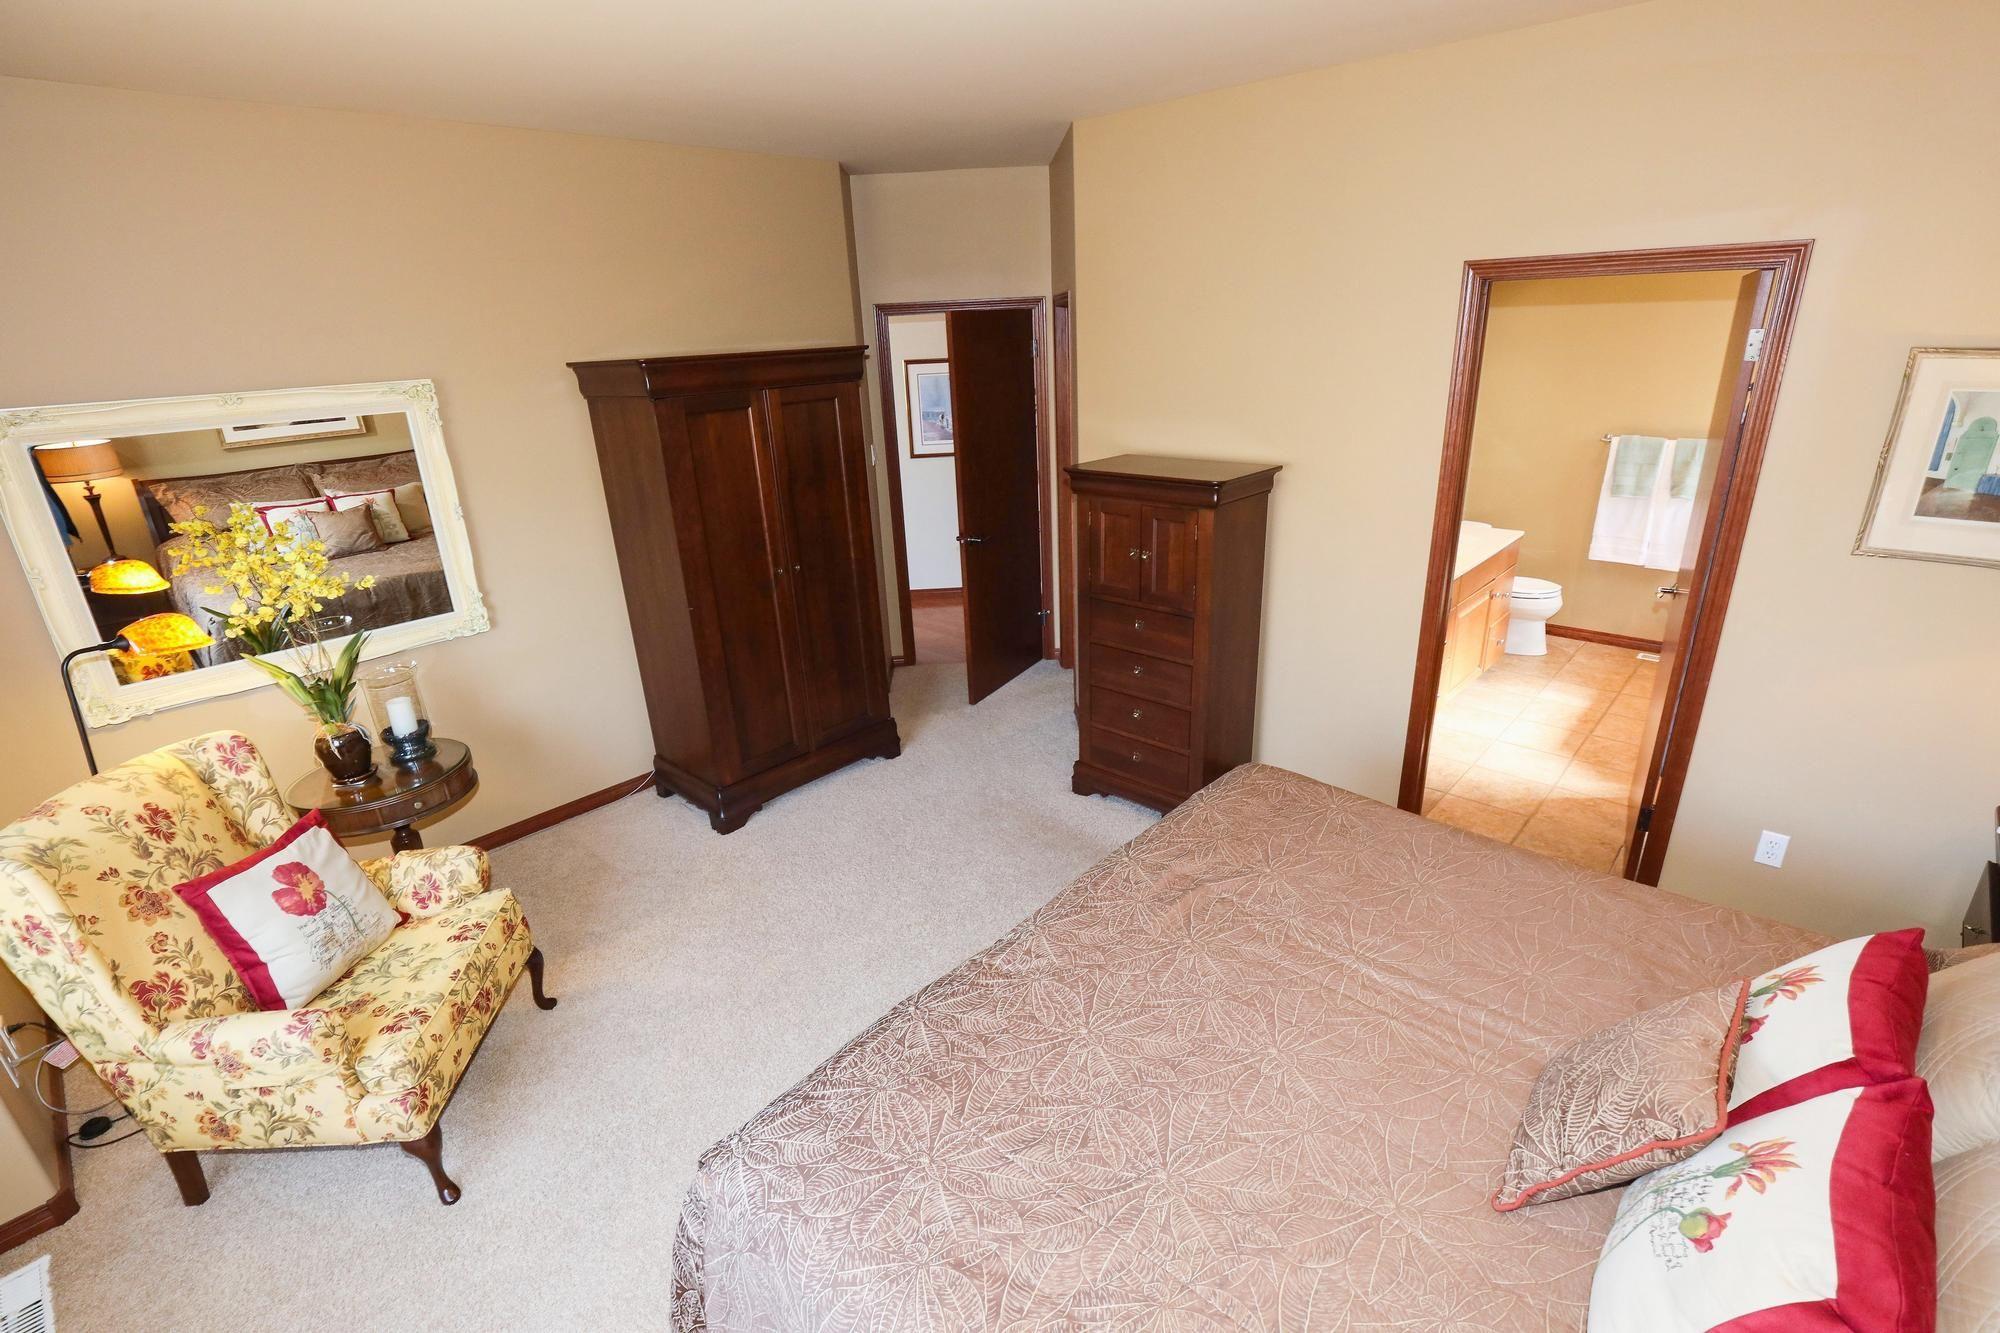 Photo 18: Photos: 7 Castle Ridge Drive in Winnipeg: Linden Ridge Single Family Detached for sale (1M)  : MLS®# 202107901